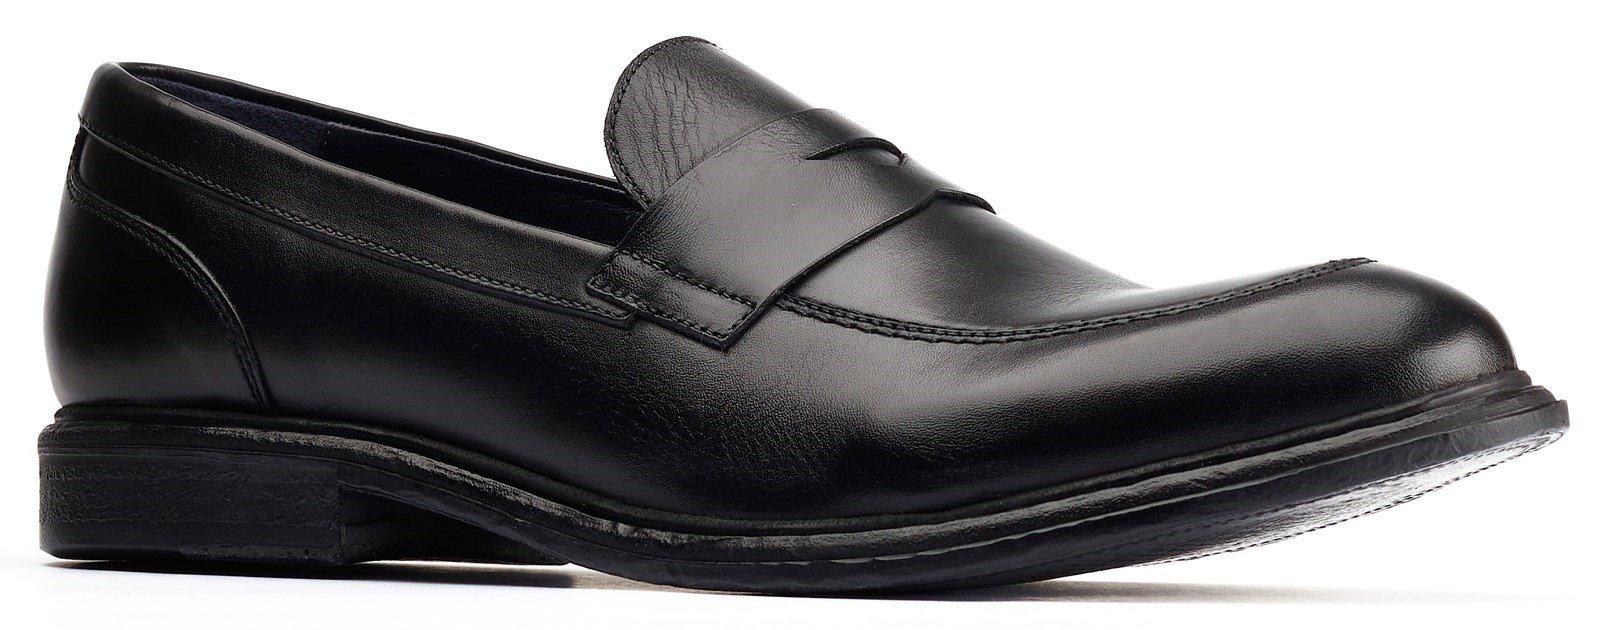 Base London Men's Scoria Loafer Black 31198 - Black 6